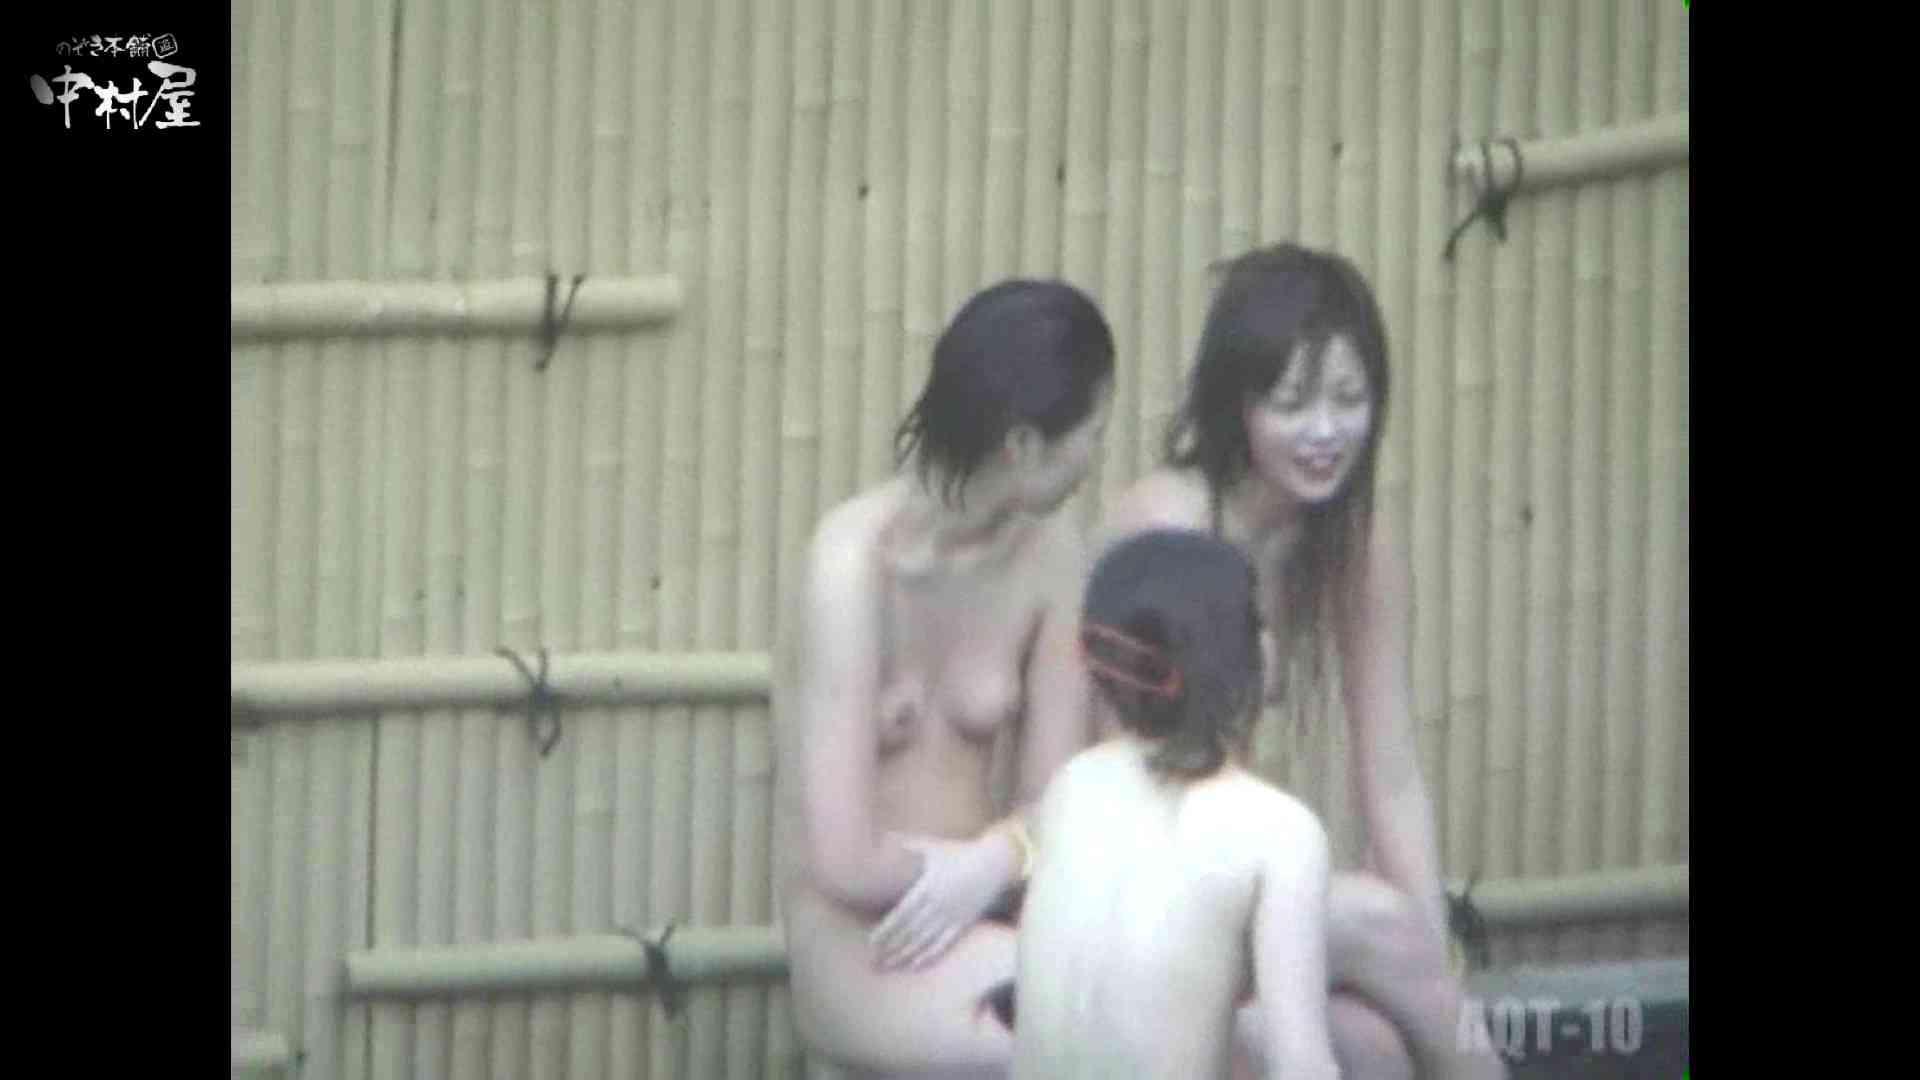 Aquaな露天風呂Vol.874潜入盗撮露天風呂十判湯 其の一 美しいOLの裸体 SEX無修正画像 85pic 54